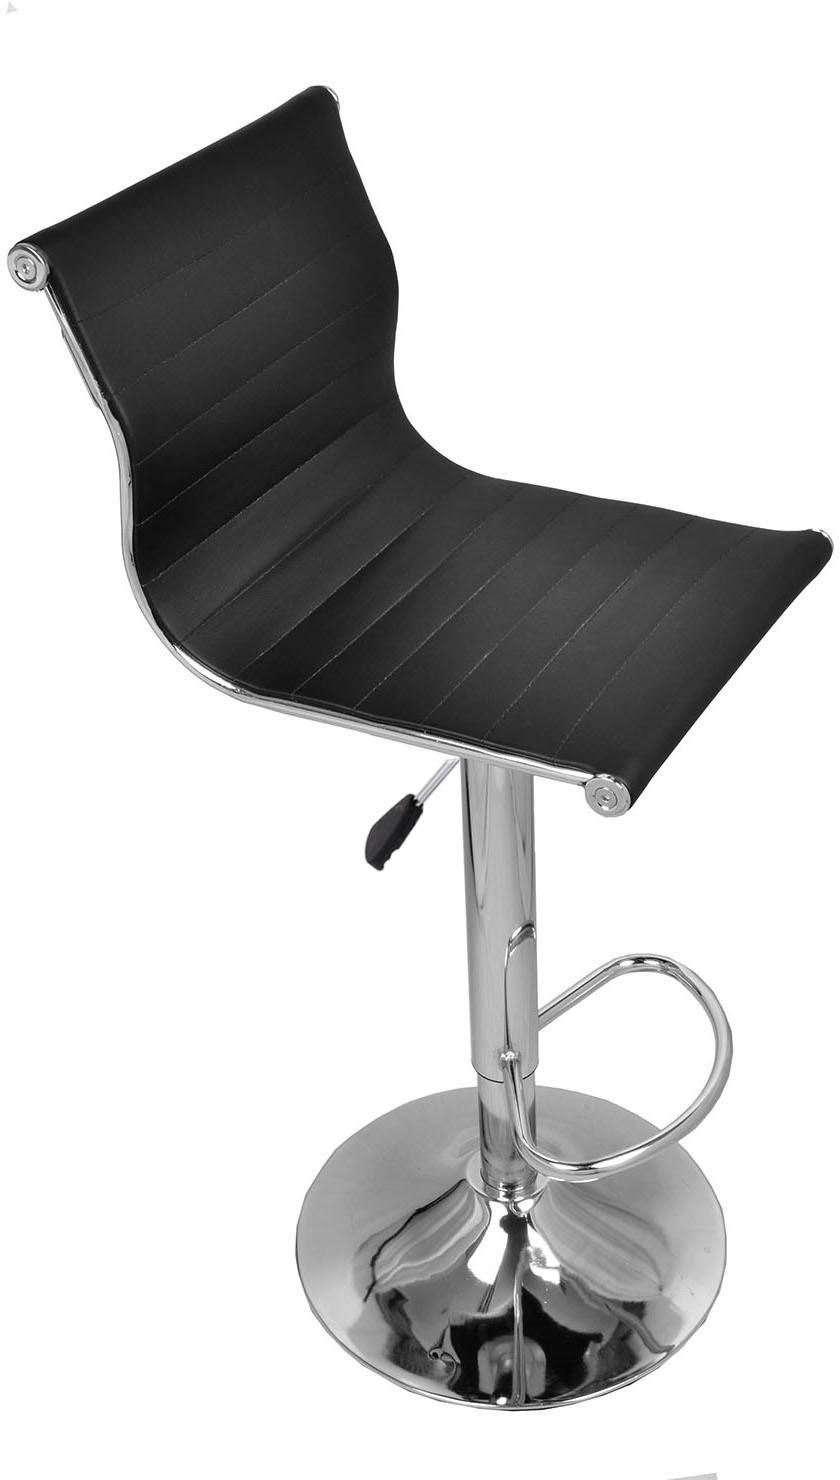 View Darla Interiors Leatherette Visitor Chair(Black) Furniture (Darla Interiors)